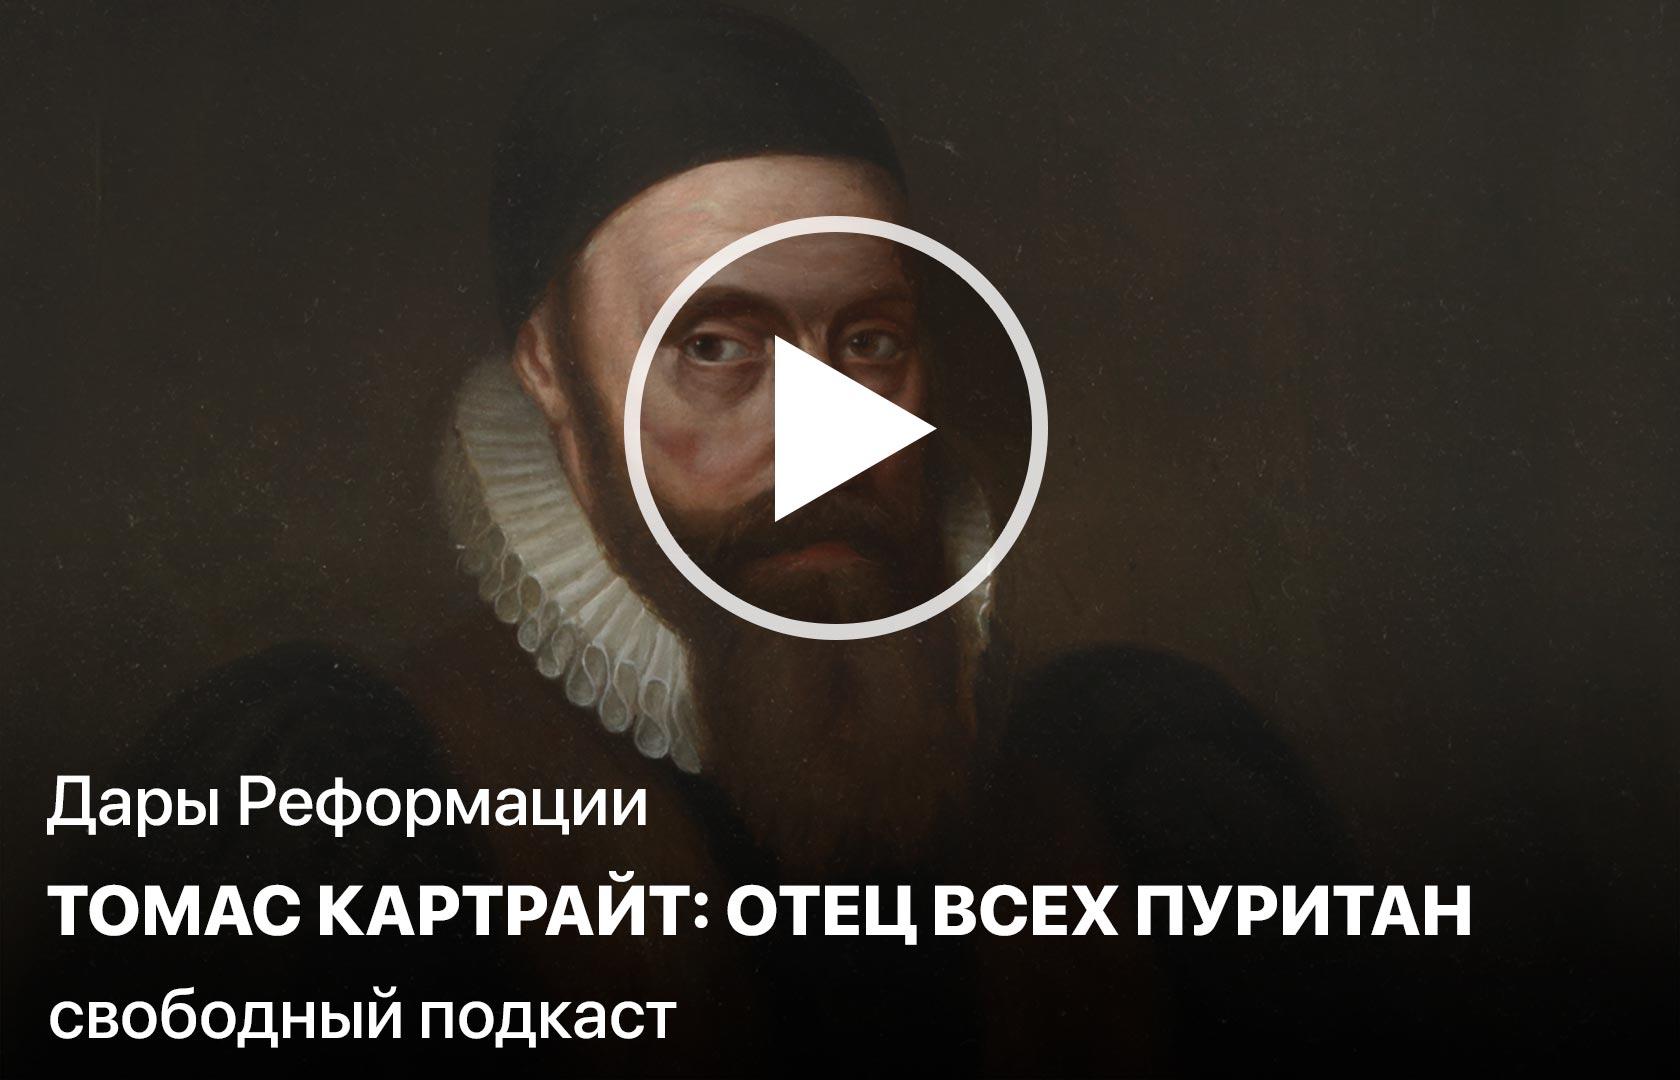 Дары Реформации. Томас Картрайт: отец всех пуритан